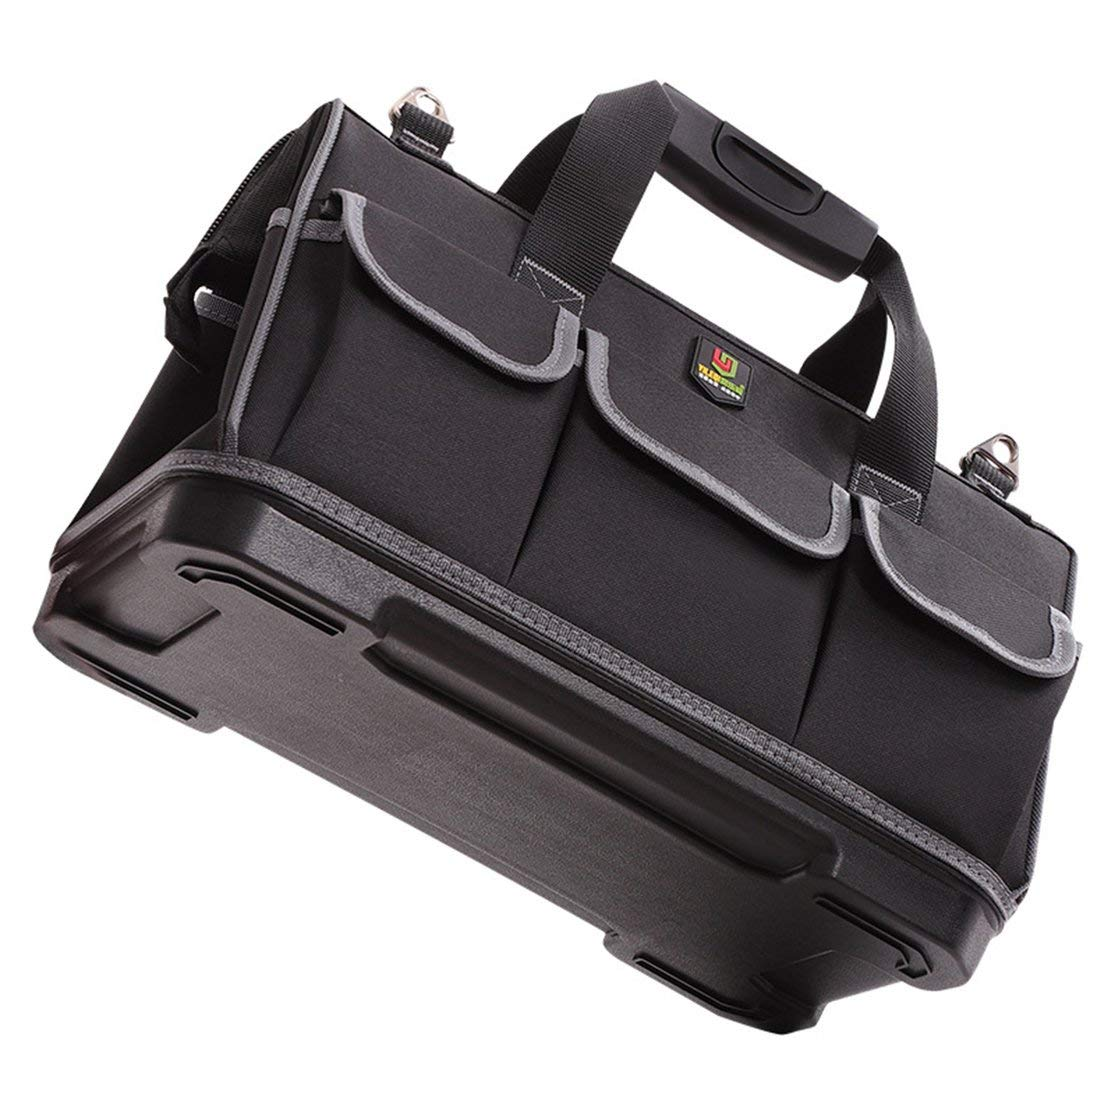 LouiseEvel215 D9 Kit de reparaci/ón de Hardware Bolsa de Herramientas Electricista Trabajo Multifunci/ón Durable Mec/ánica Oxford Tela Bolsa de Almacenamiento Organizador Bolsa